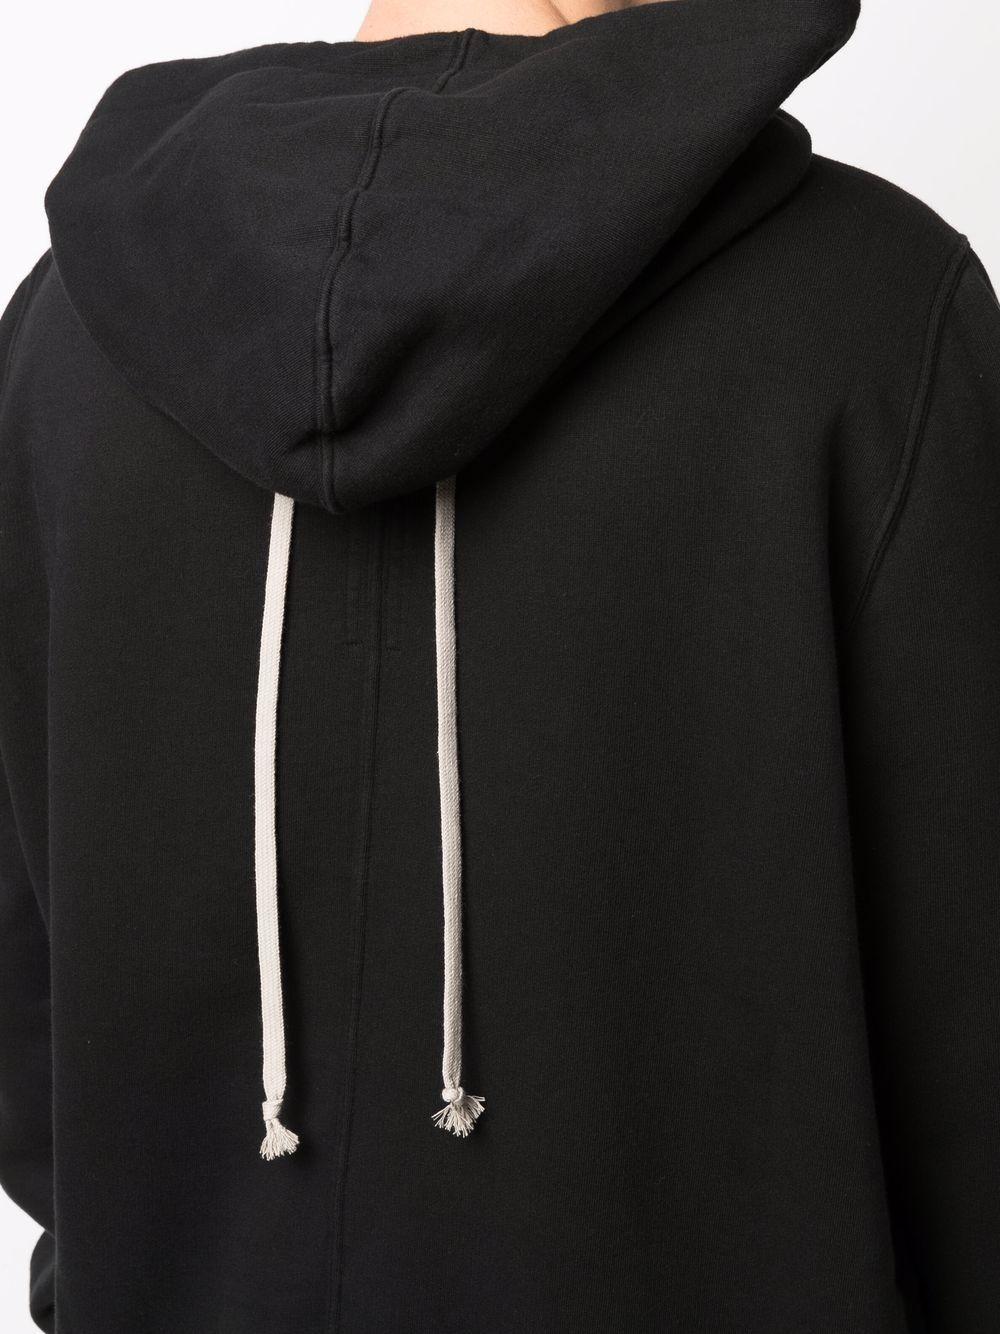 granbury hoodie man black in cotton RICK OWENS DRKSHDW   Sweatshirts   DU02A3289 F09